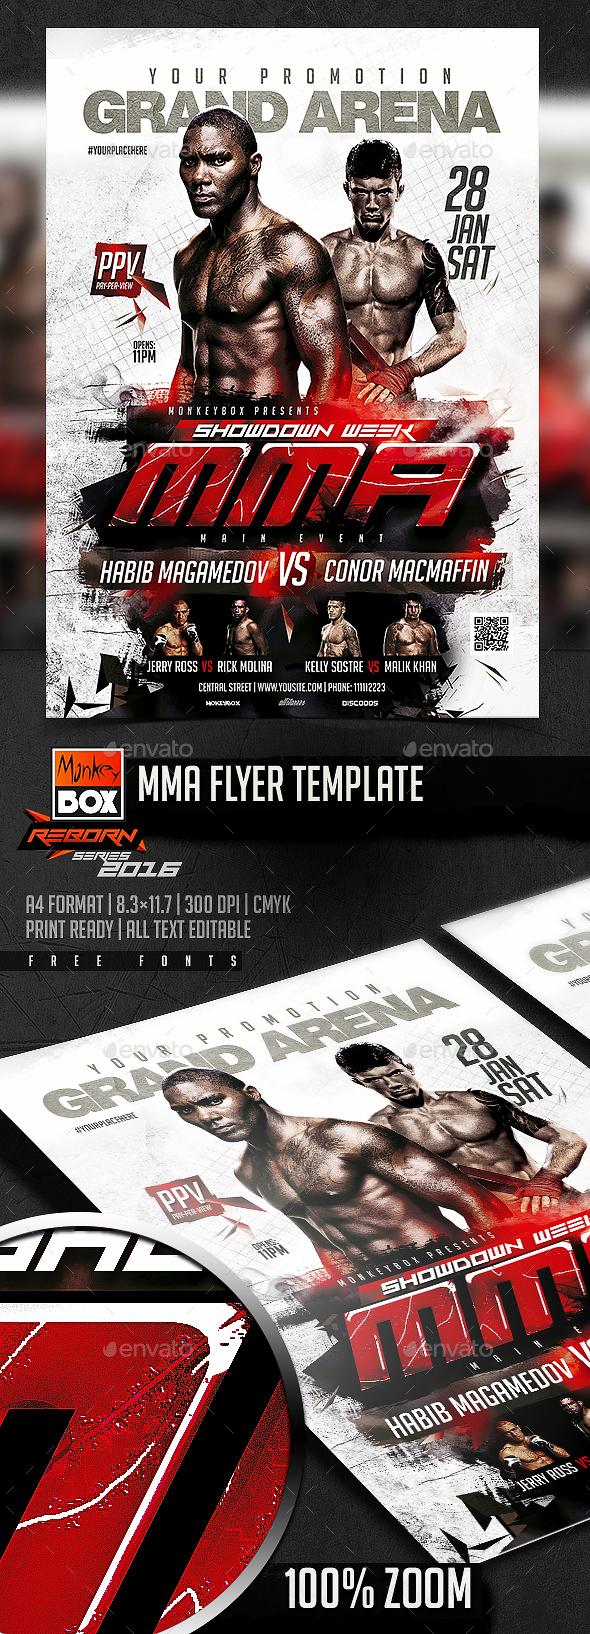 MMA Flyer Template - Flyers Print Templates